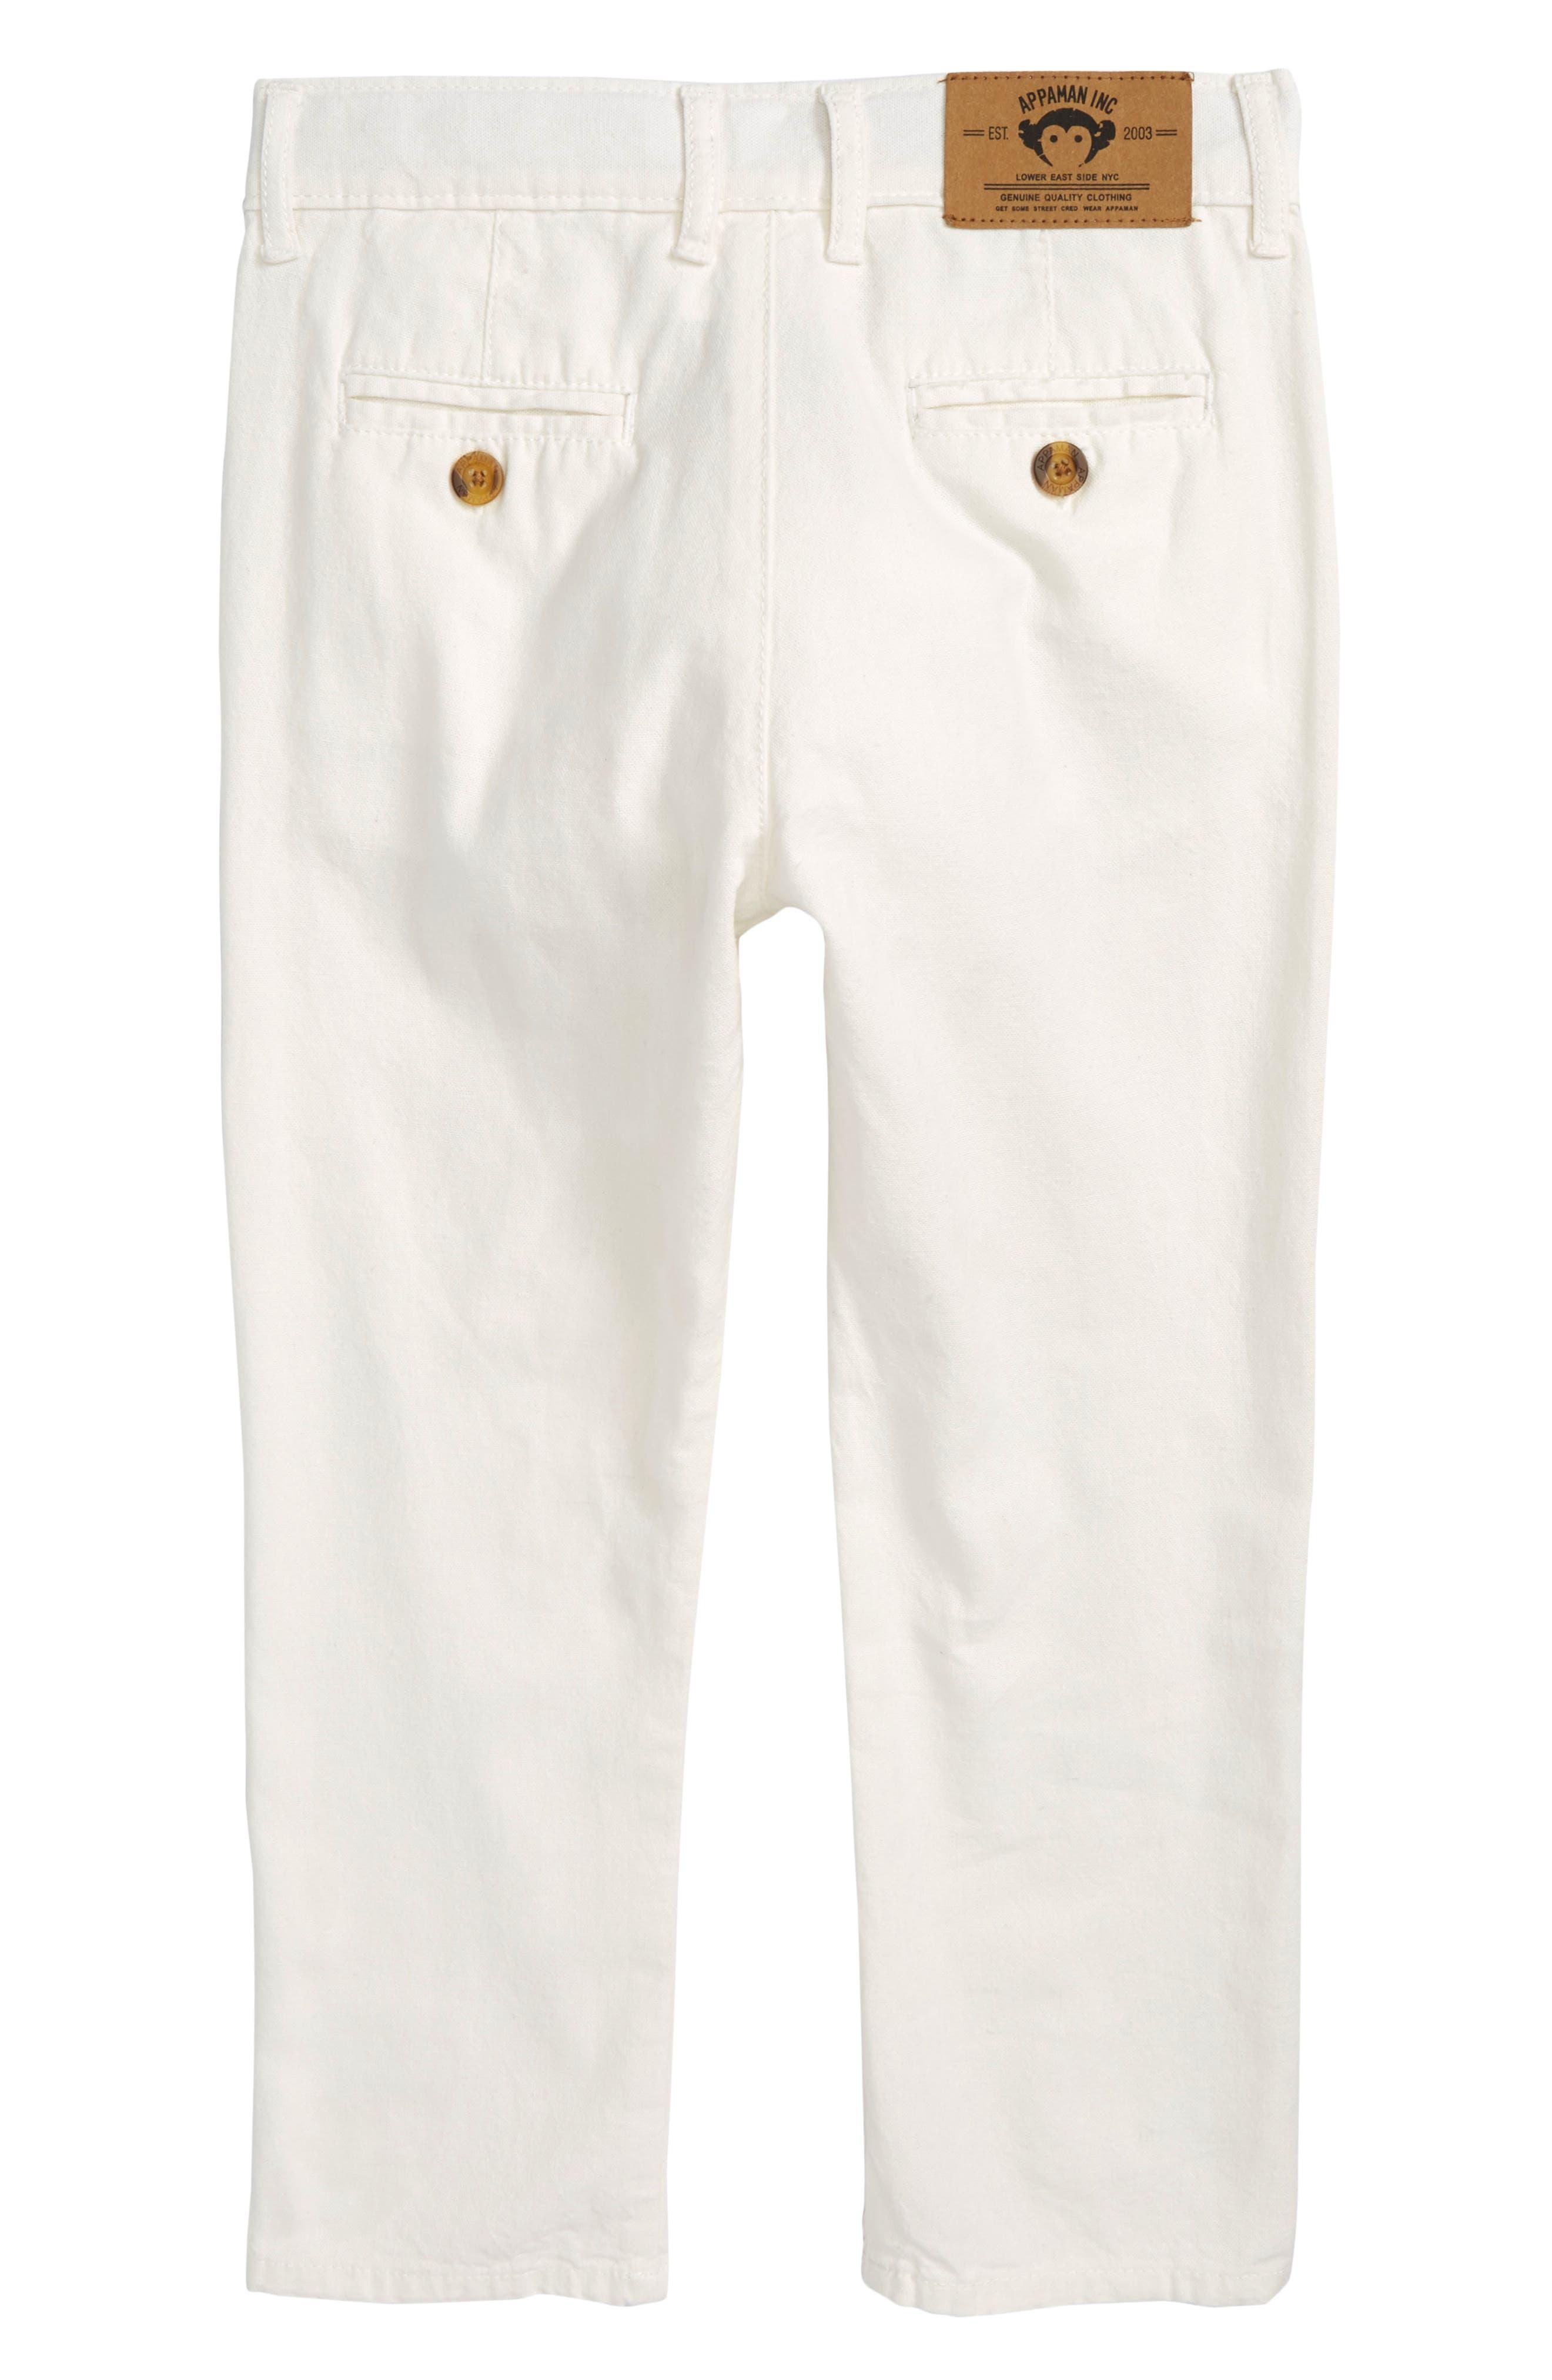 Beach Pants,                             Alternate thumbnail 2, color,                             Ivory